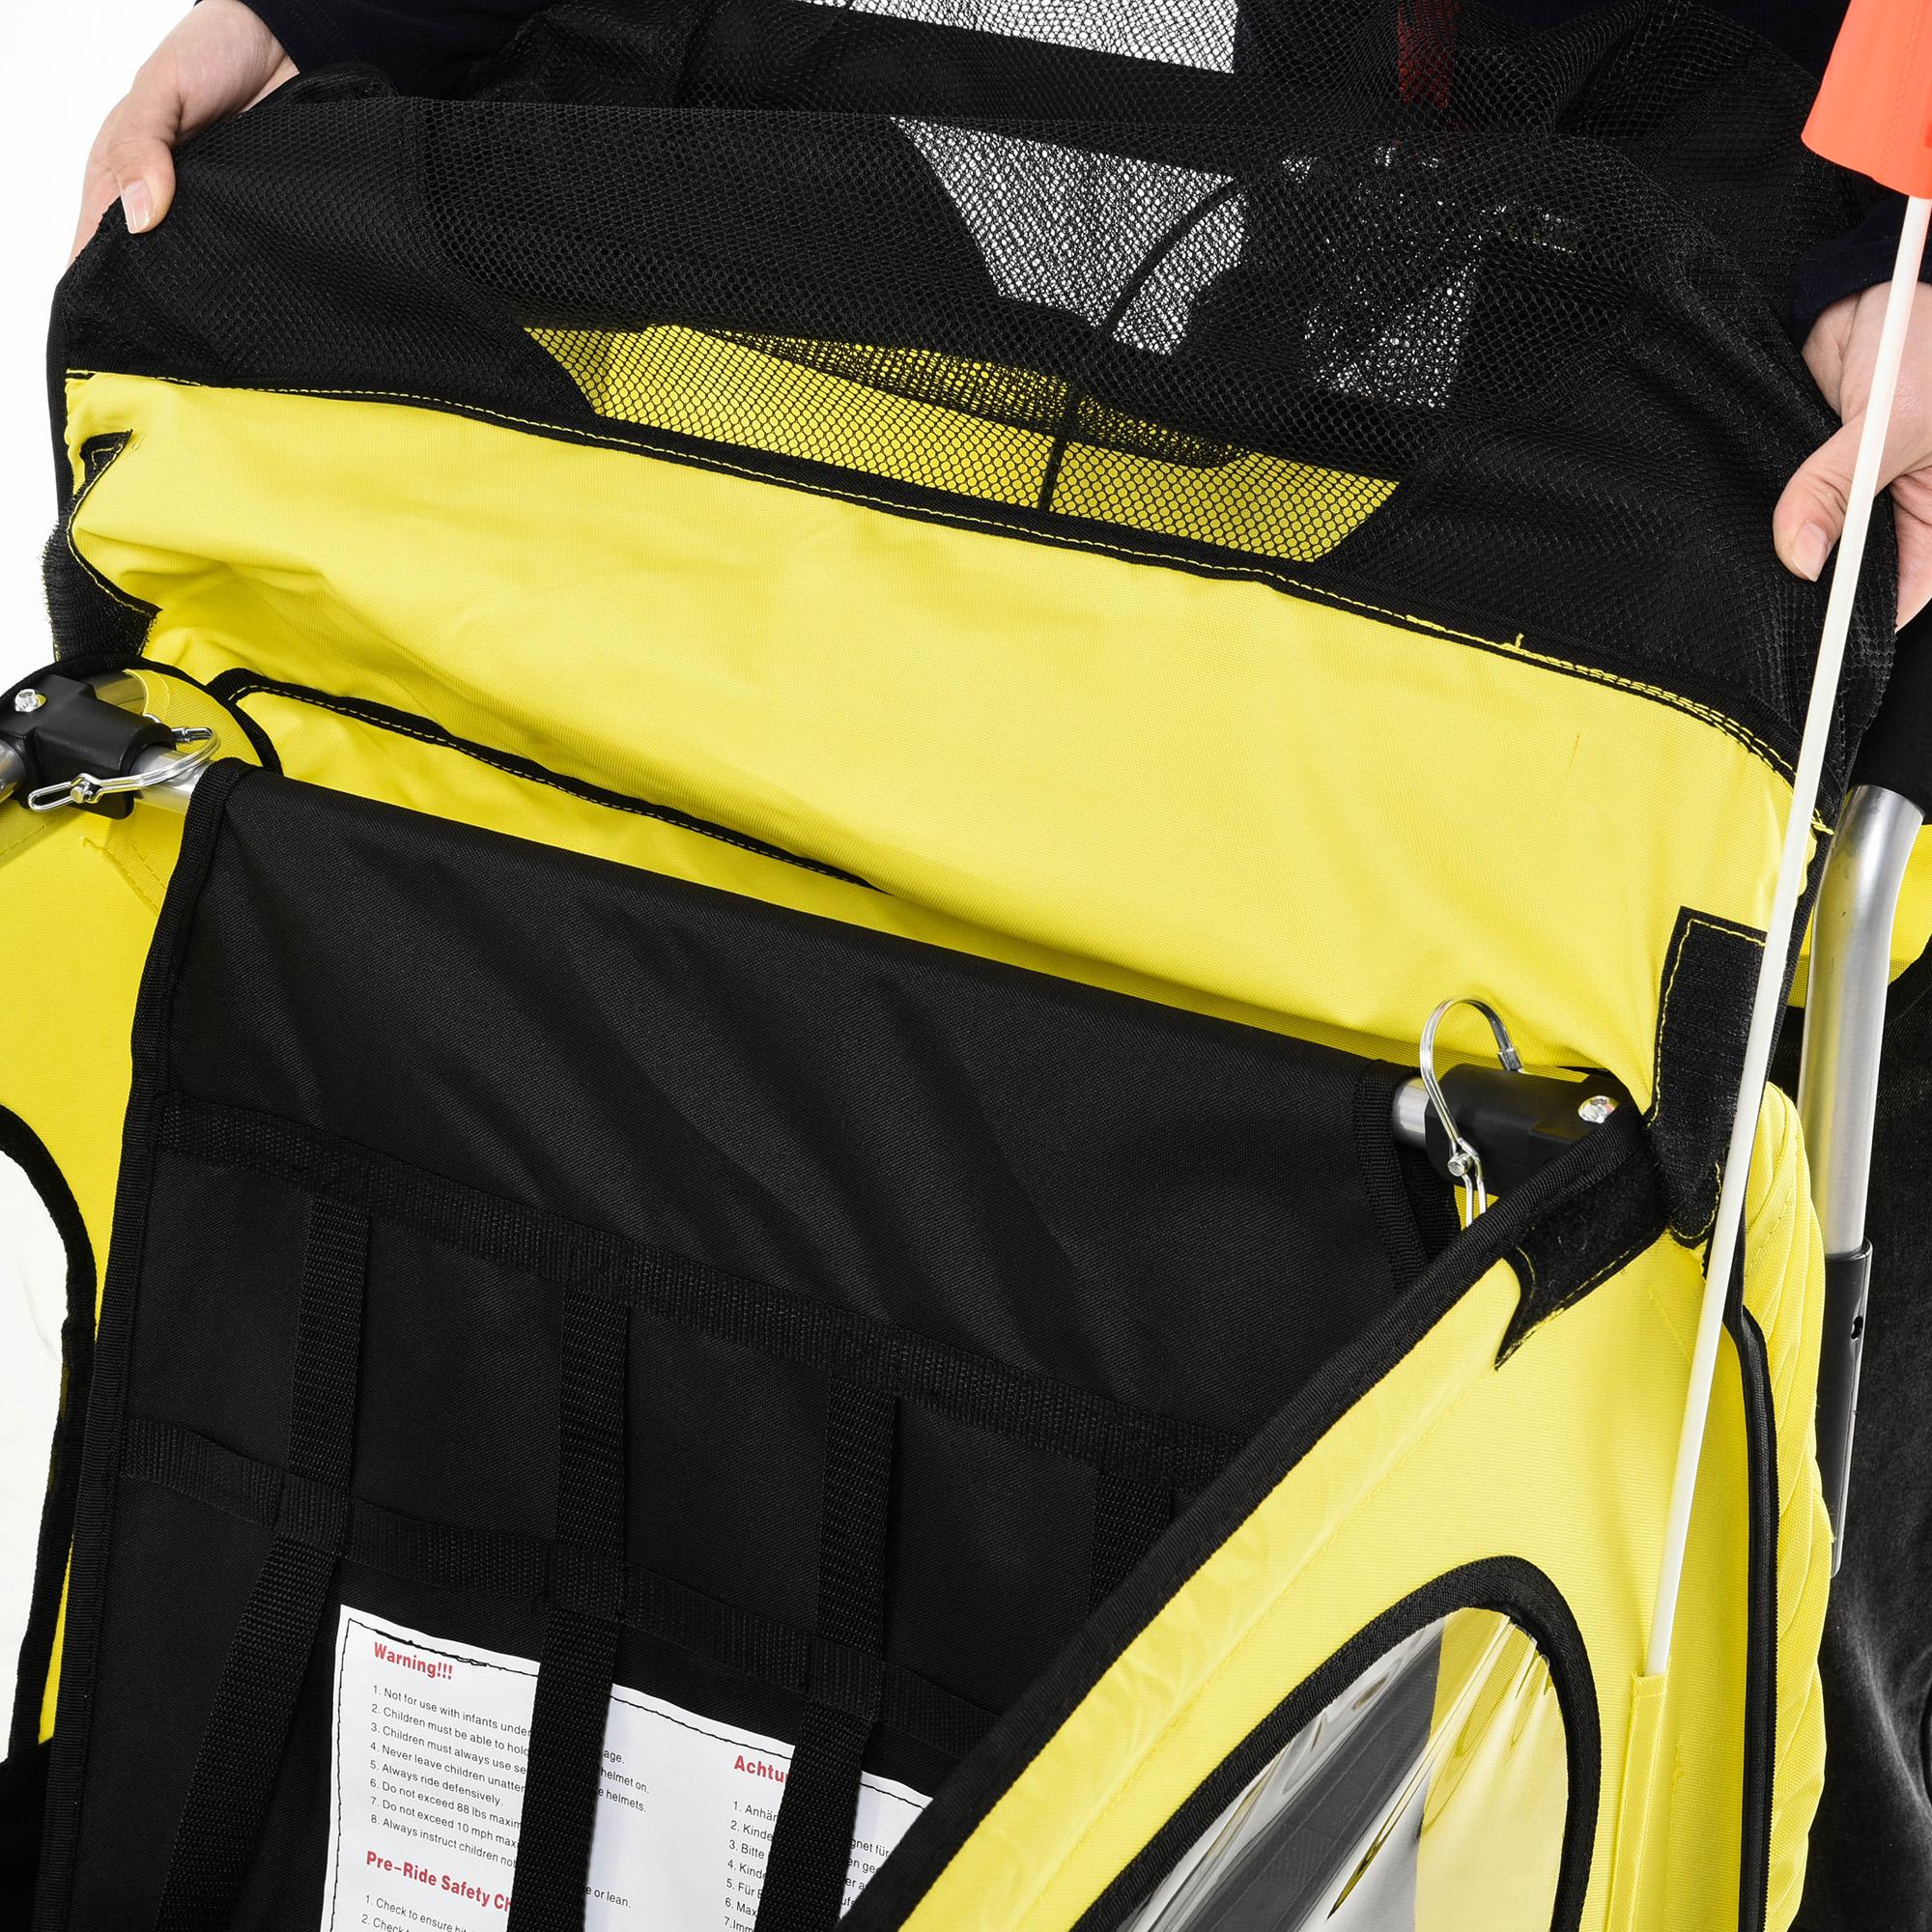 miniatura 8 - Remolque Bicicleta Niño 2 PLAZAS+Amortiguador Kit Footing Freno Bandera Cubierta